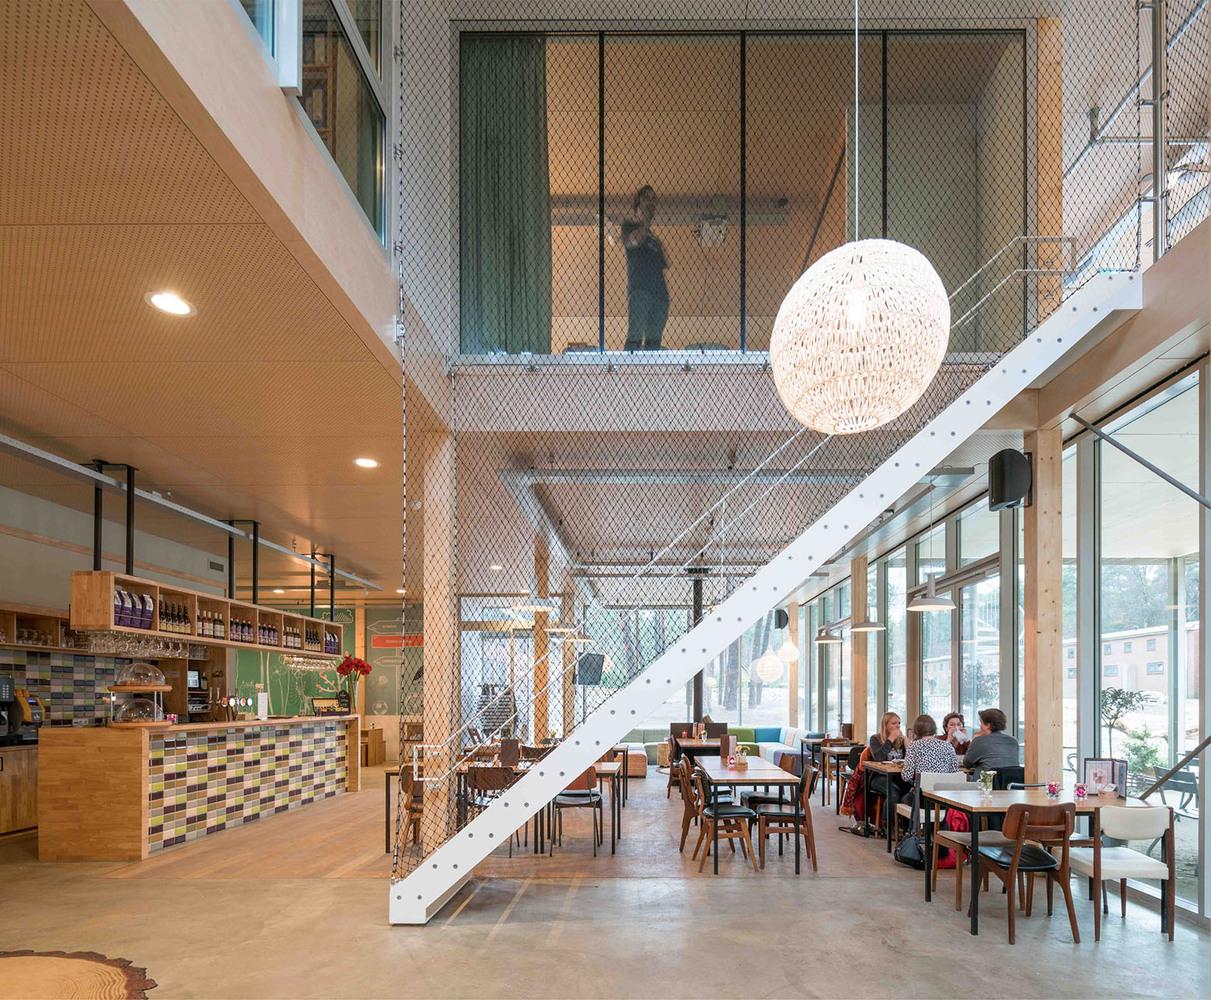 Gallery of Stayokay Hostel and Natuurpodium / Personal Architecture - 10